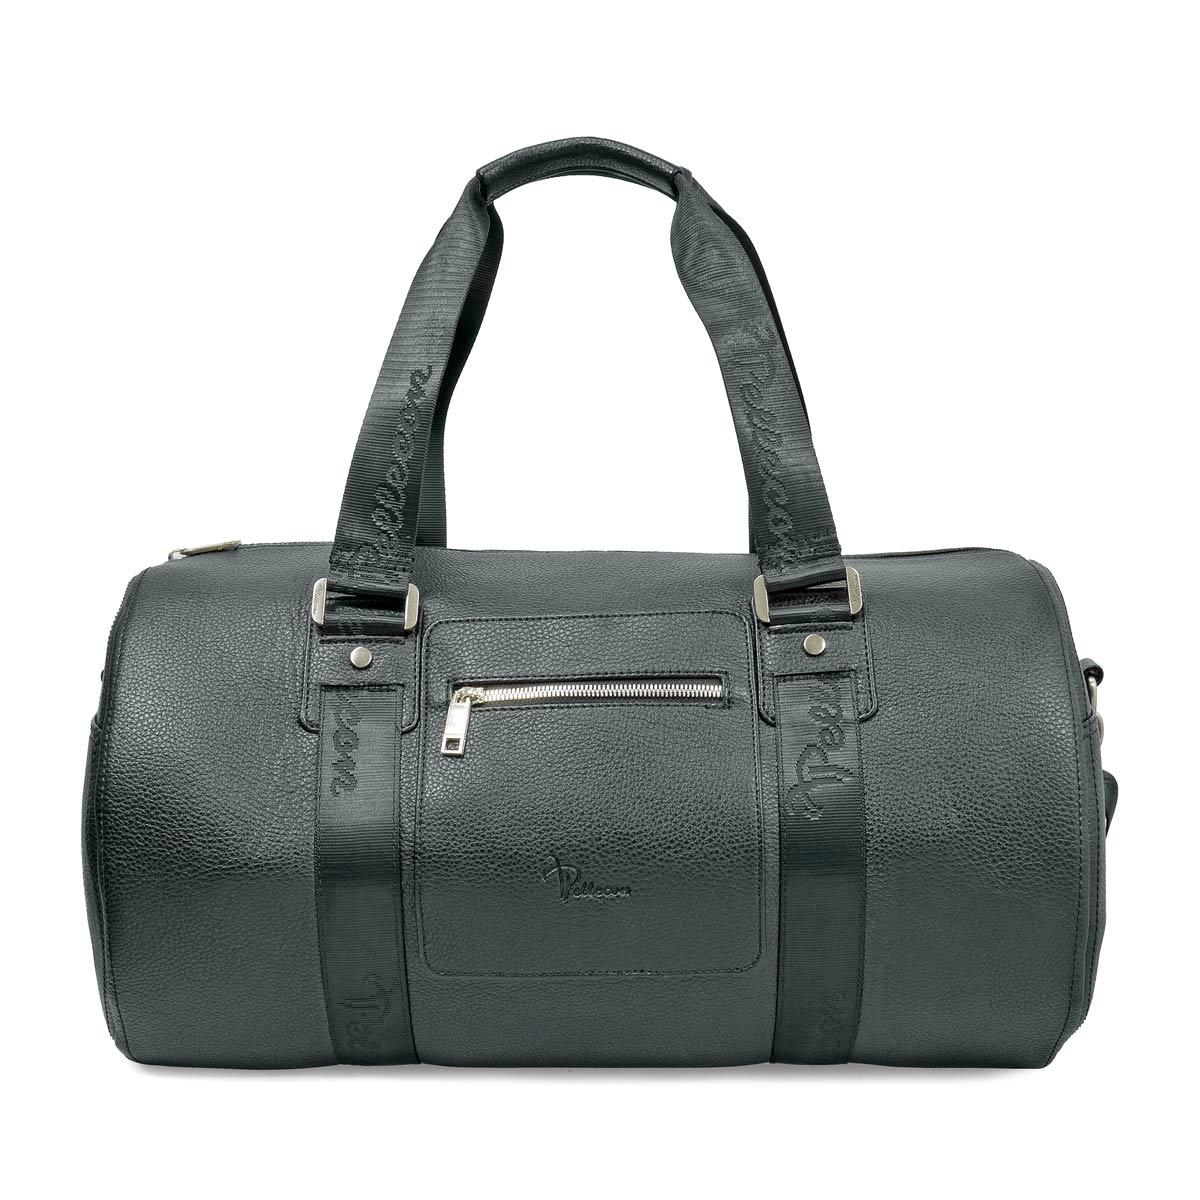 812-628-1 Bag Travel Пеллекон